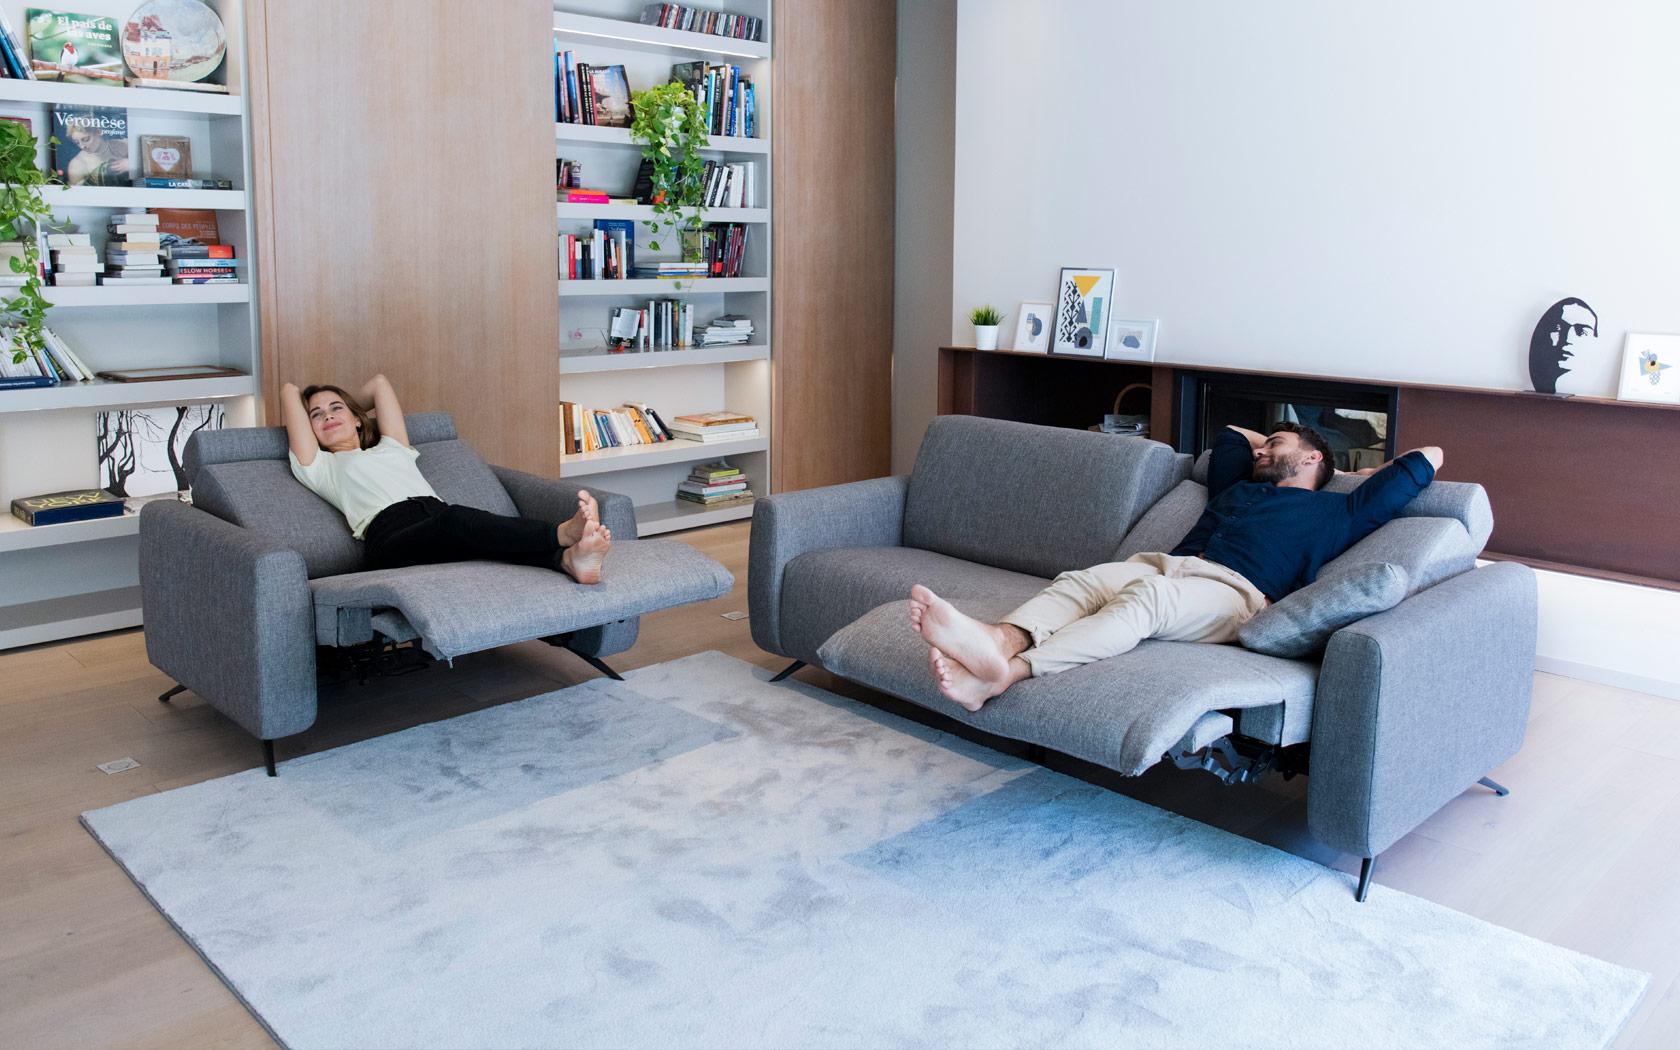 Atlanta sofa relax 2020 07